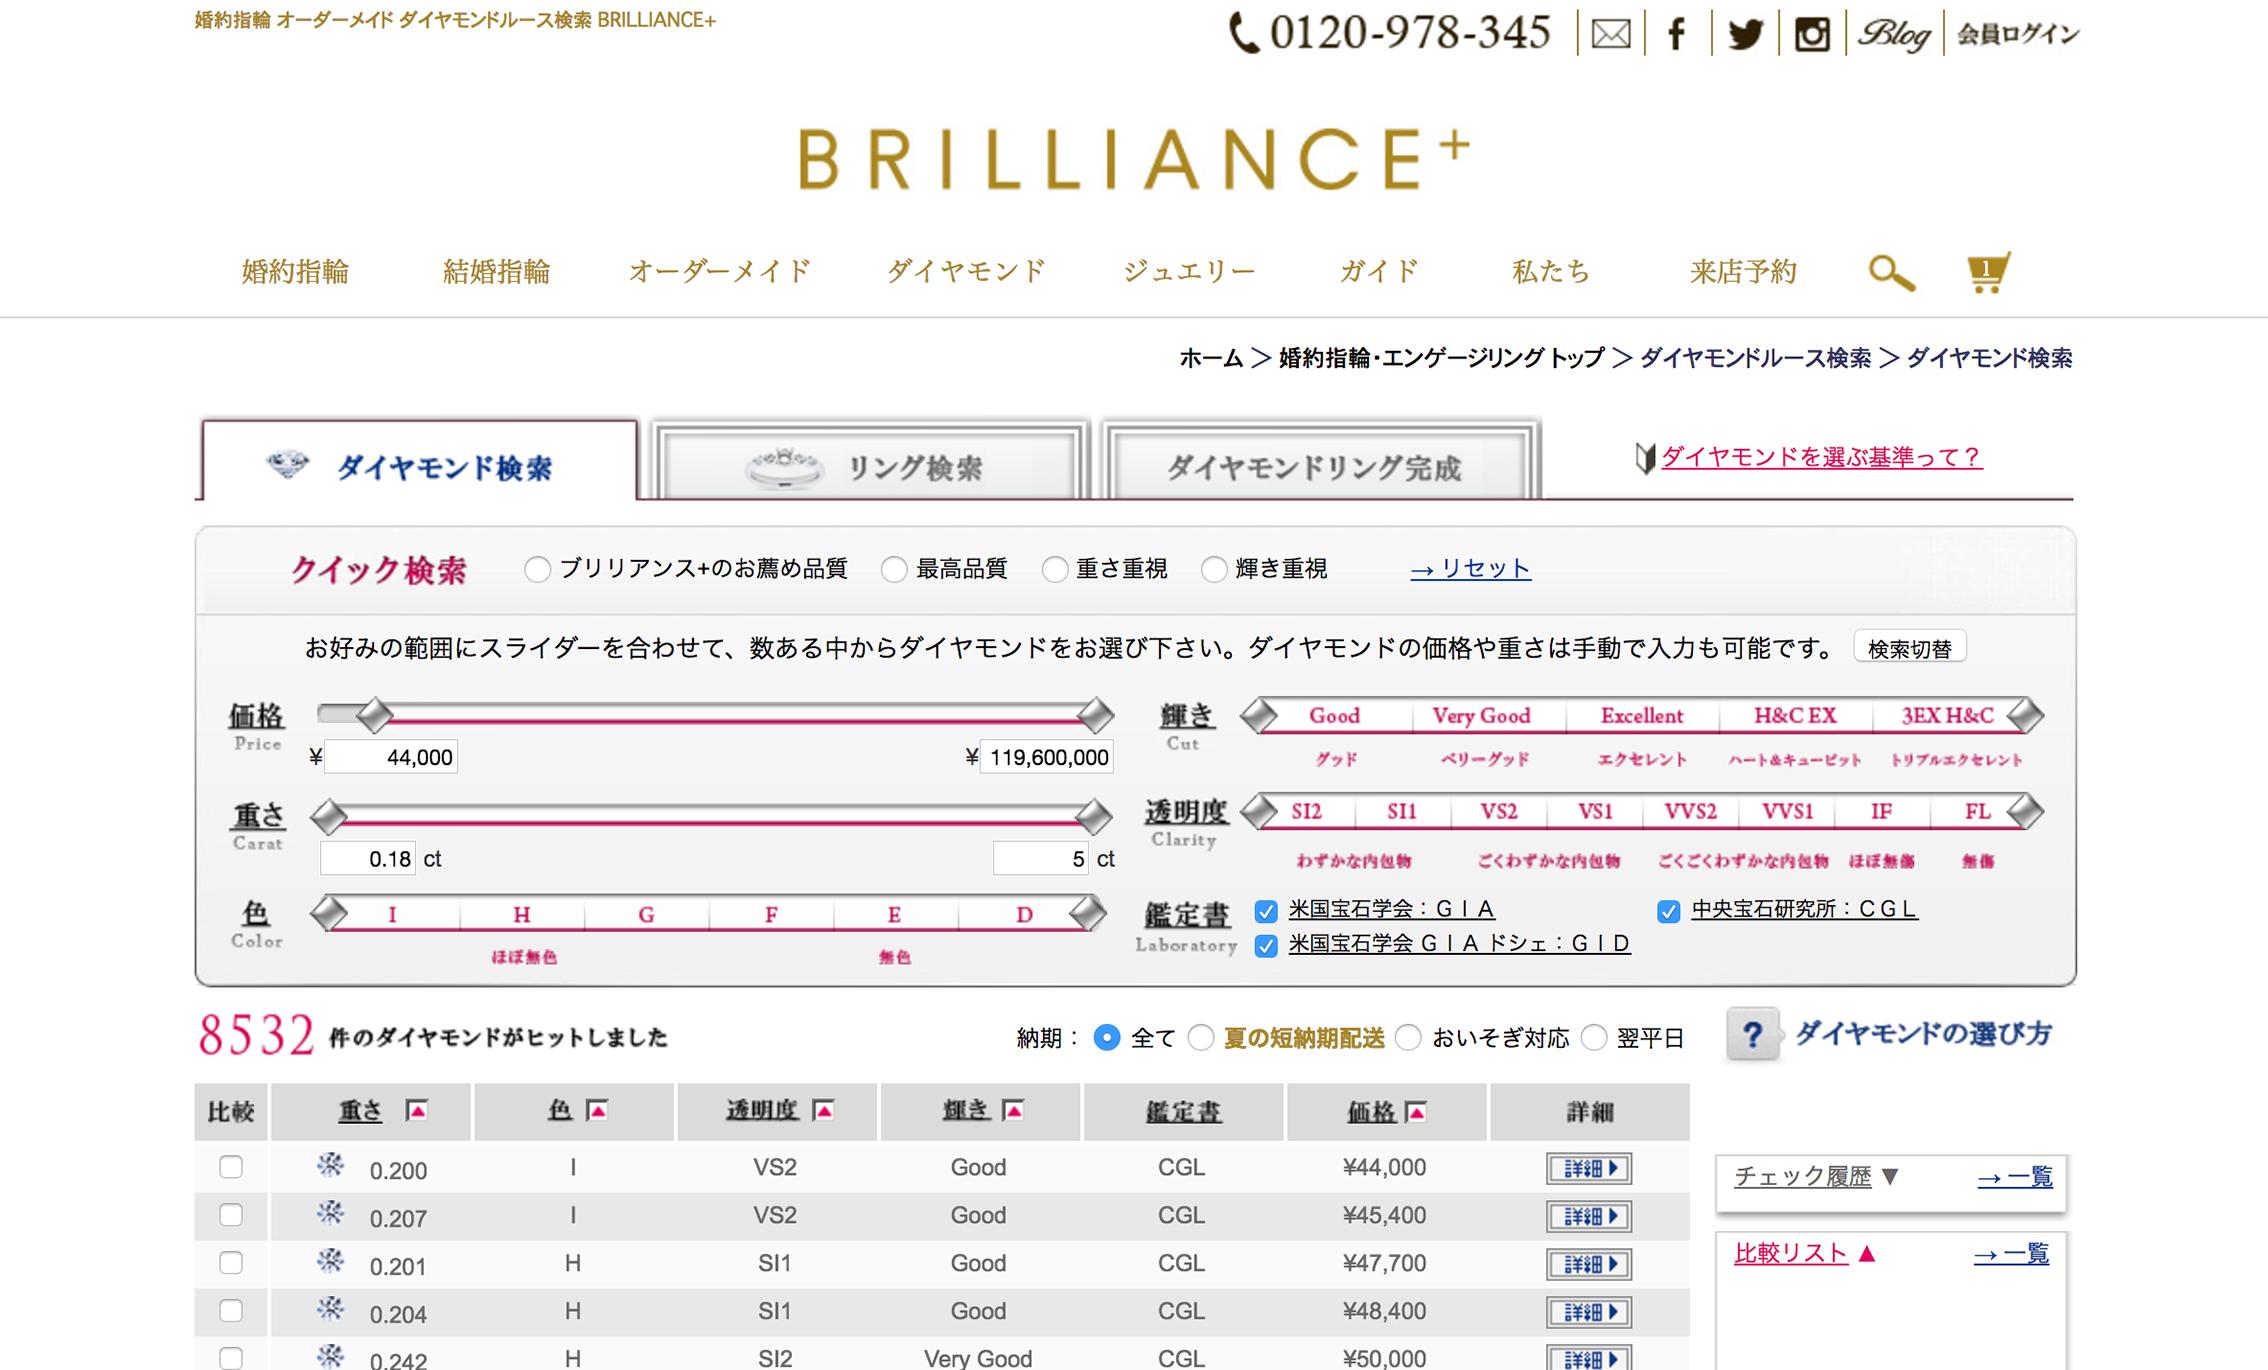 Brilliance+ダイヤモンドの注文